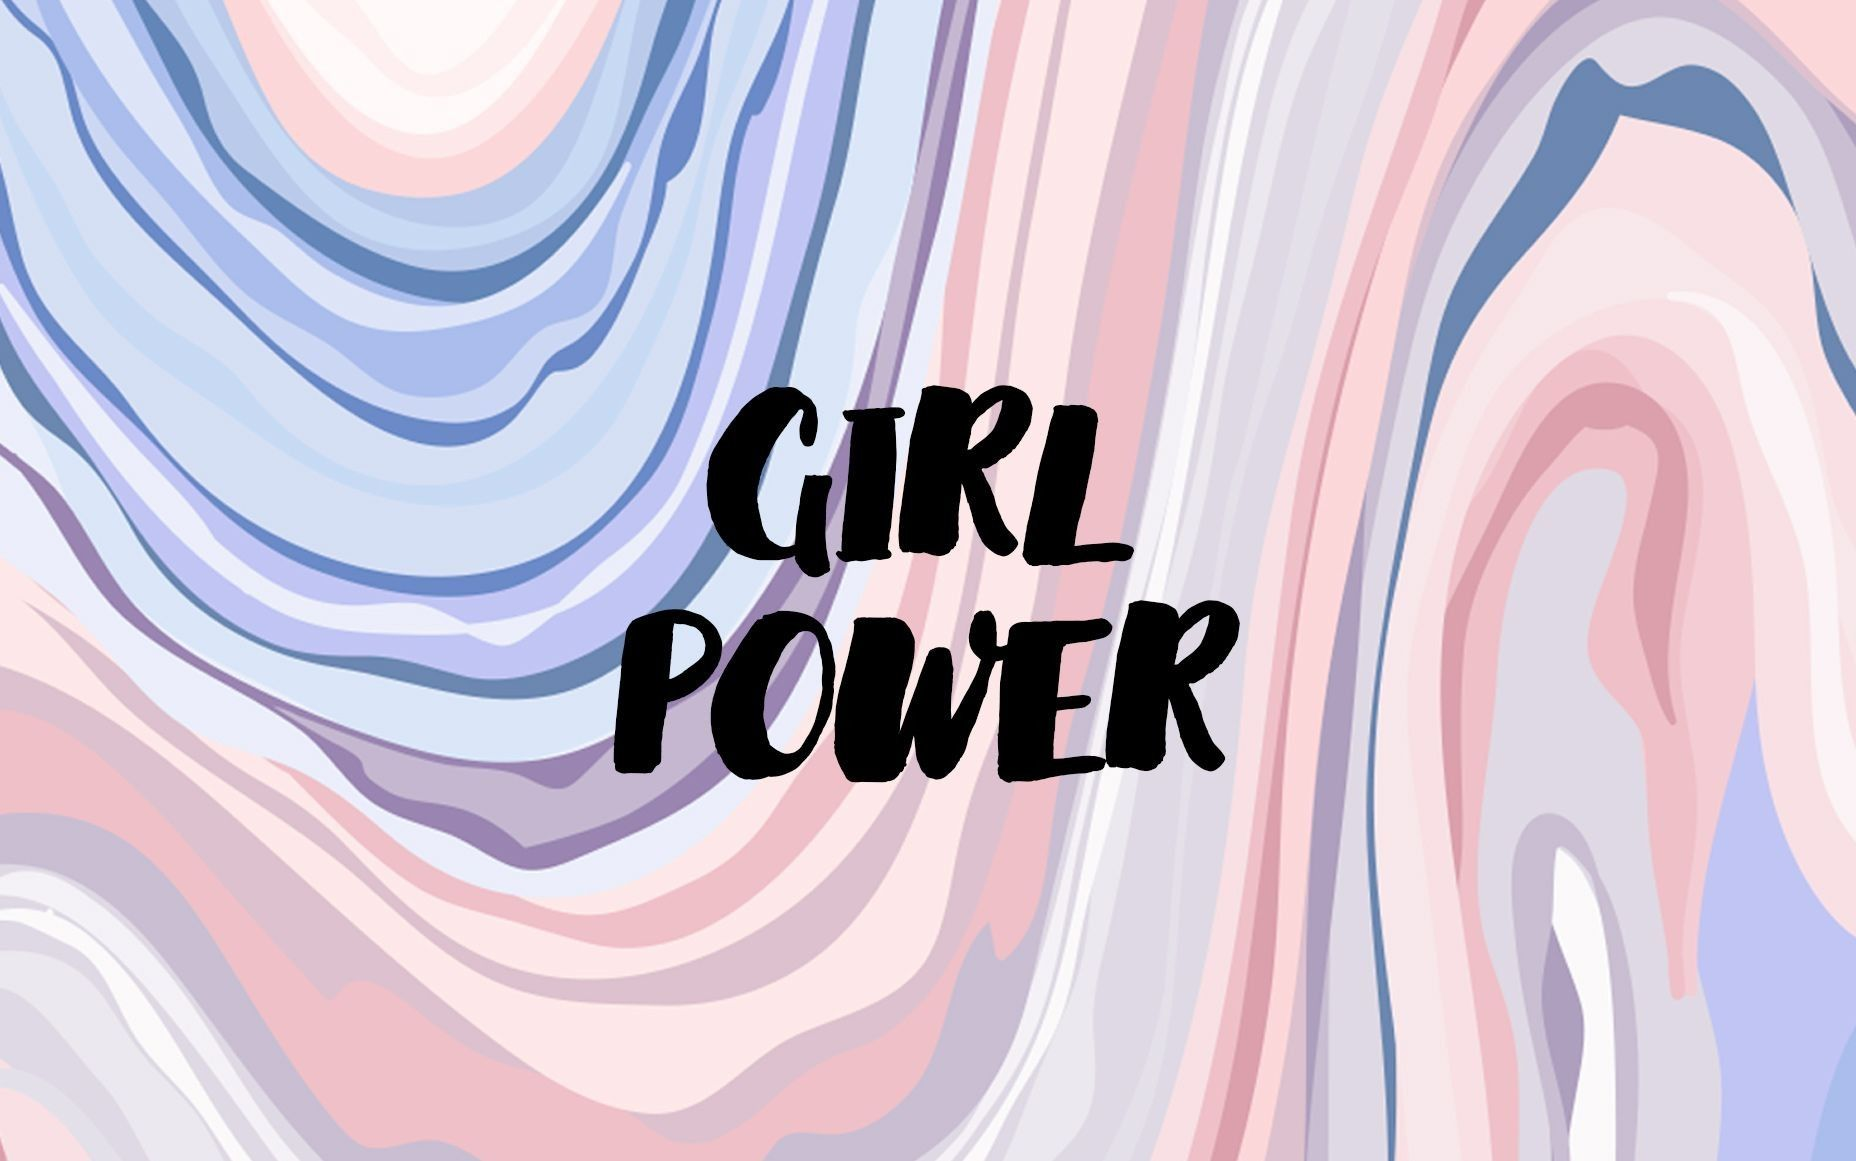 Inspirational Girly Desktop Backgrounds Laptop Wallpaper Power Wallpaper Cute Desktop Wallpaper